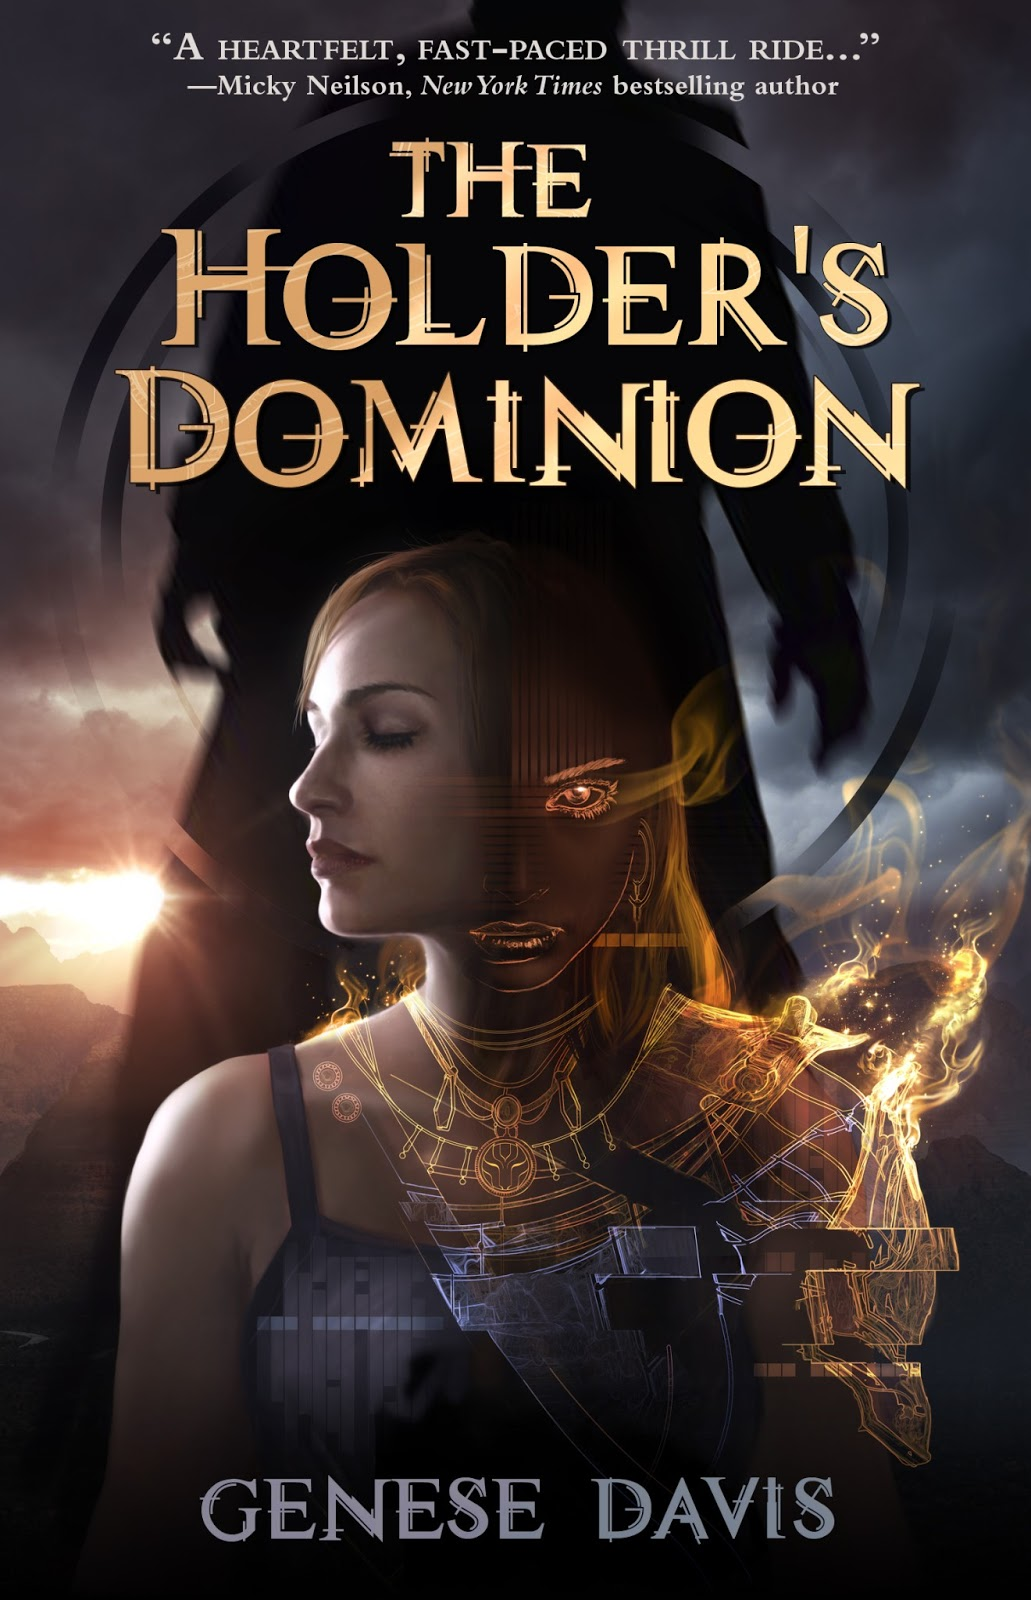 http://1.bp.blogspot.com/-Iog3GP2Ymhc/US4QQcxrWYI/AAAAAAAABVk/3OA688HOb8w/s1600/The+Holder\'s+Dominion+Cover+Art+Genese+Davis.jpg